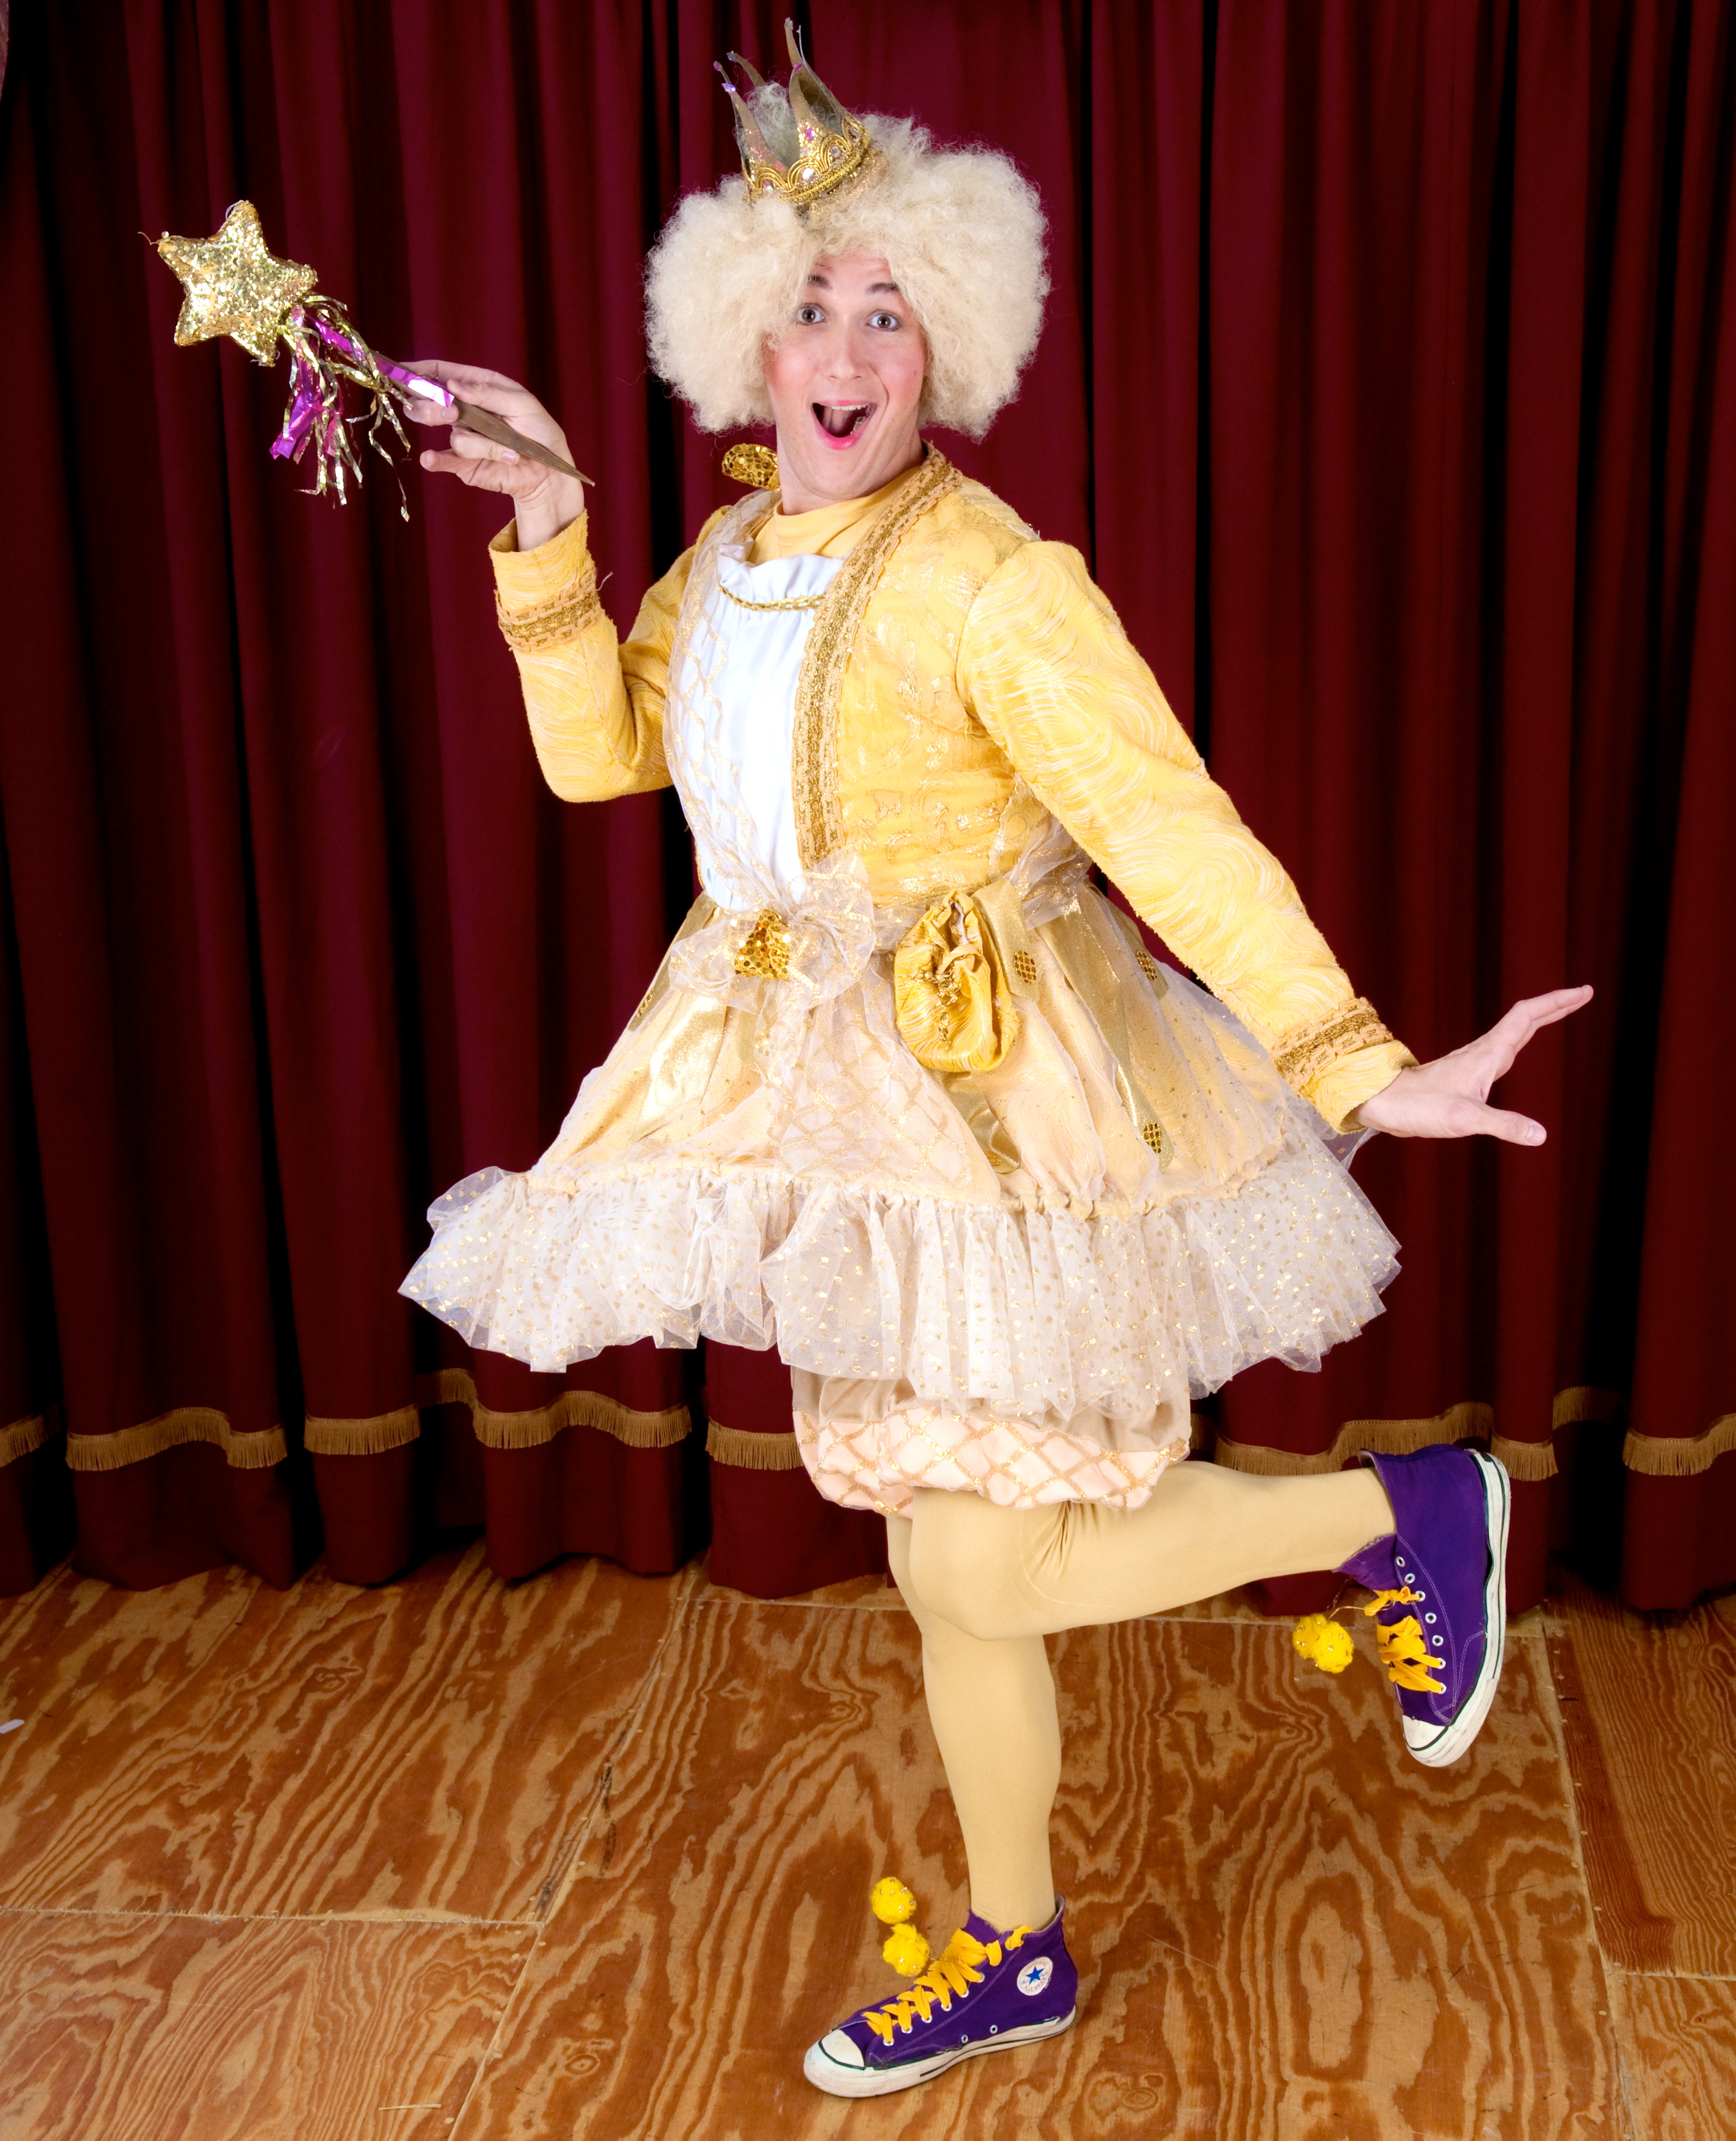 Cinderella: A Fractured Fairy Tale